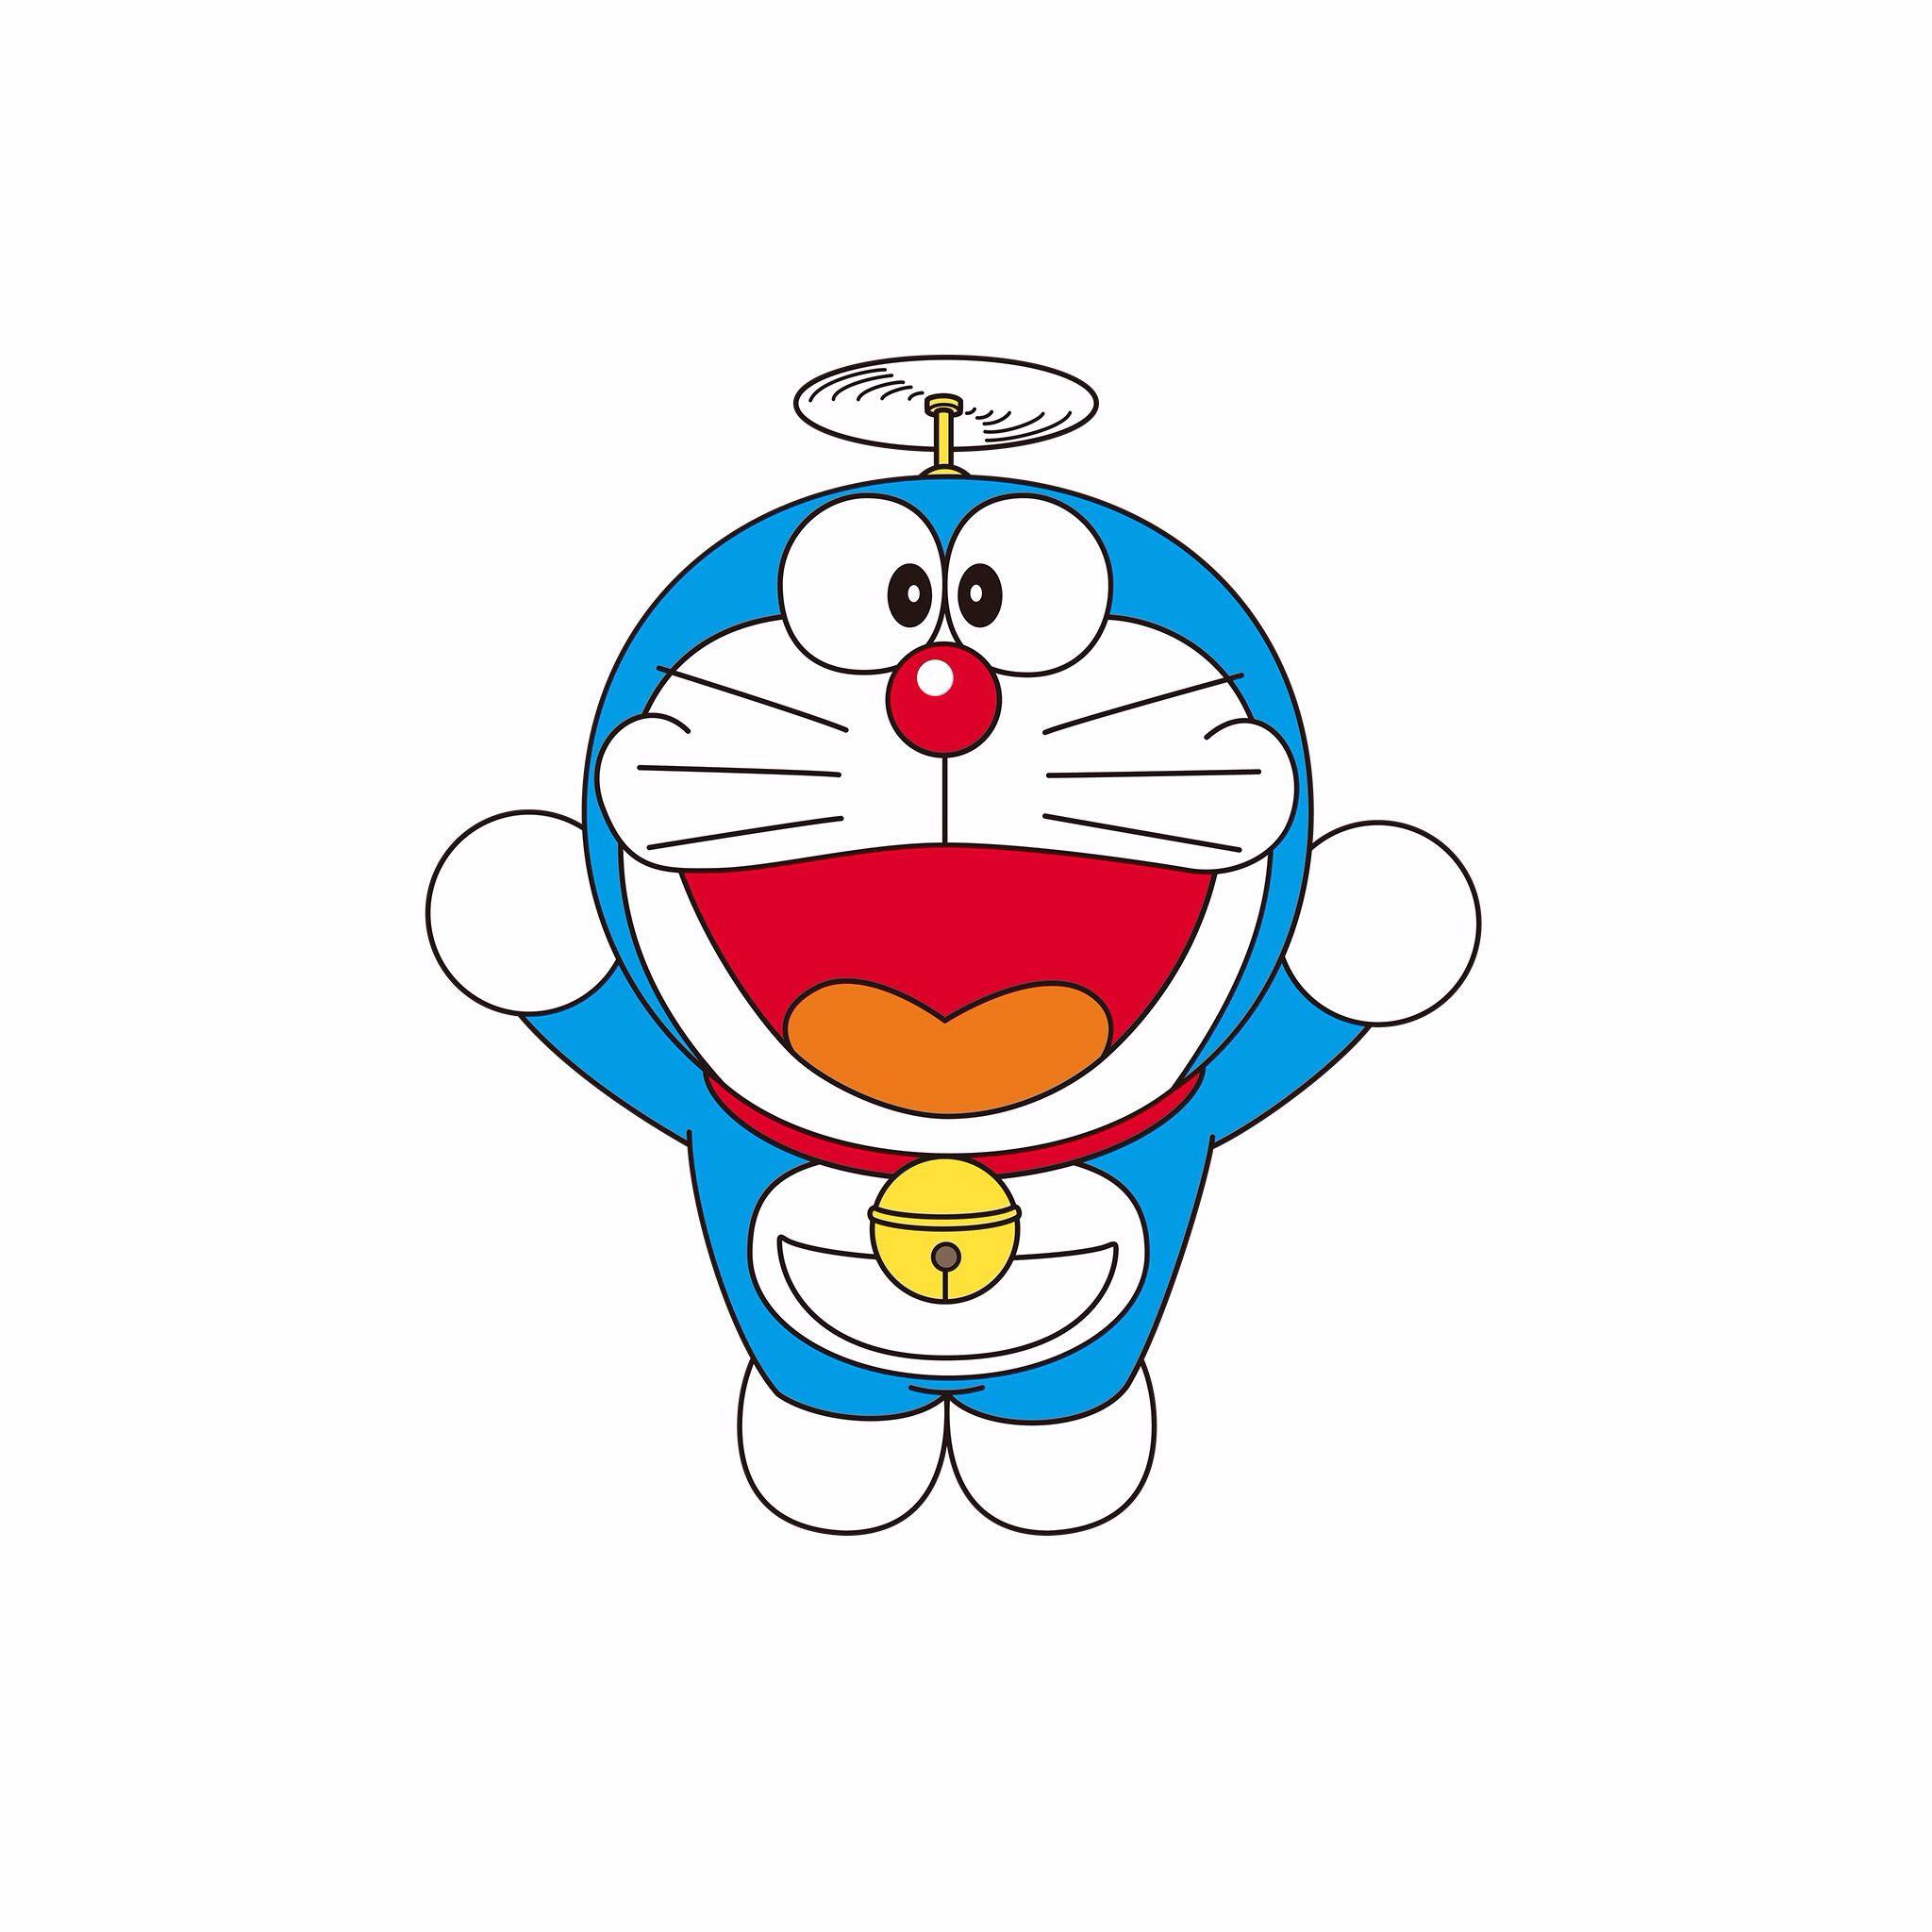 Doramon Doraemon Robot Cat Anime